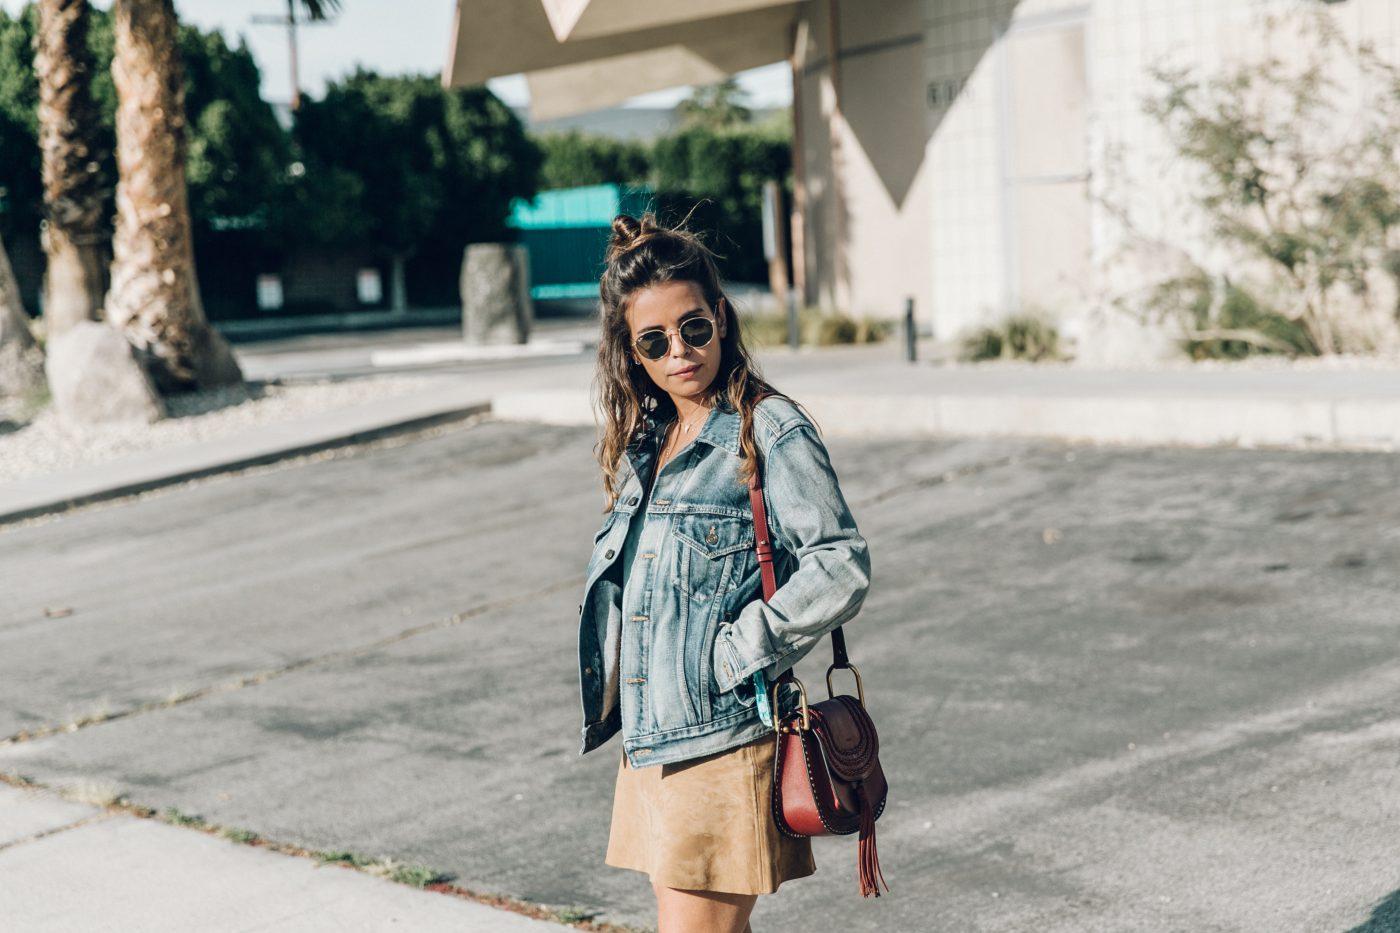 Denim_Jacket-Saint_Laurent-Chloe_Top-Suede_Skirt-Chloe_Hudson_Bag-Espadrilles-Coachella-Palm_Springs-Outfit-Collage_Vintage-79